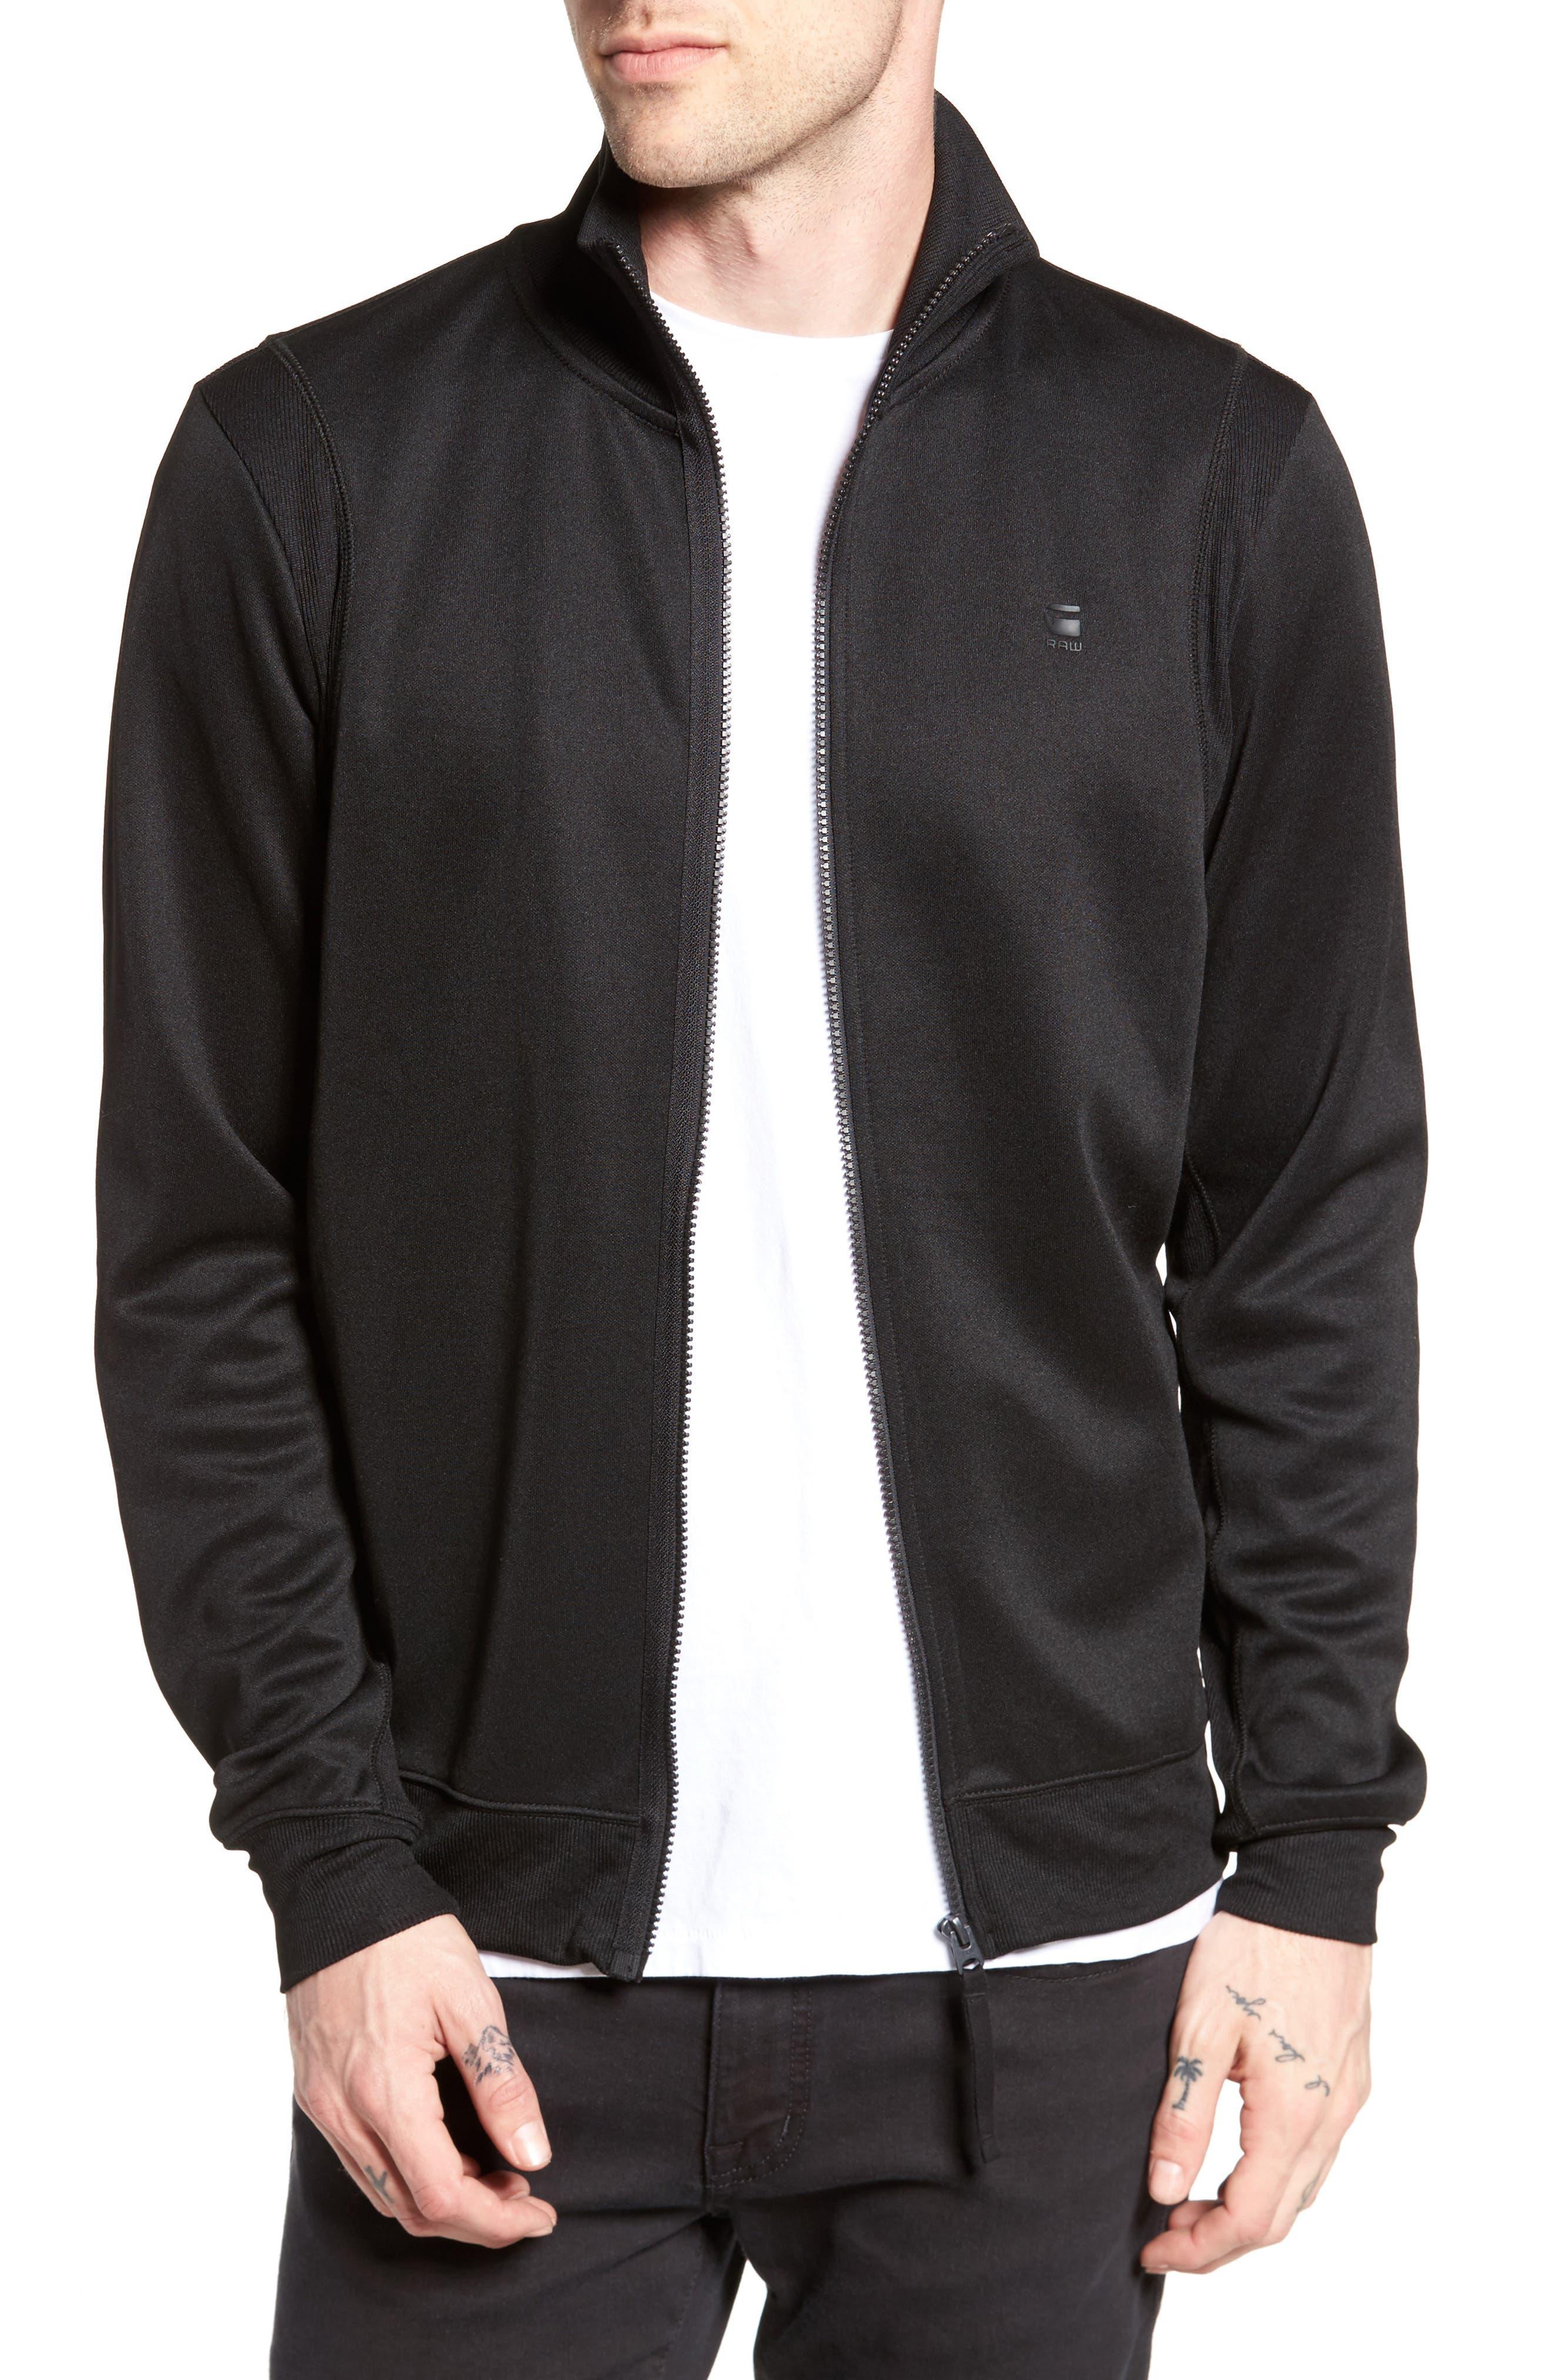 G-Star Raw Motac Tracktop Sweatshirt